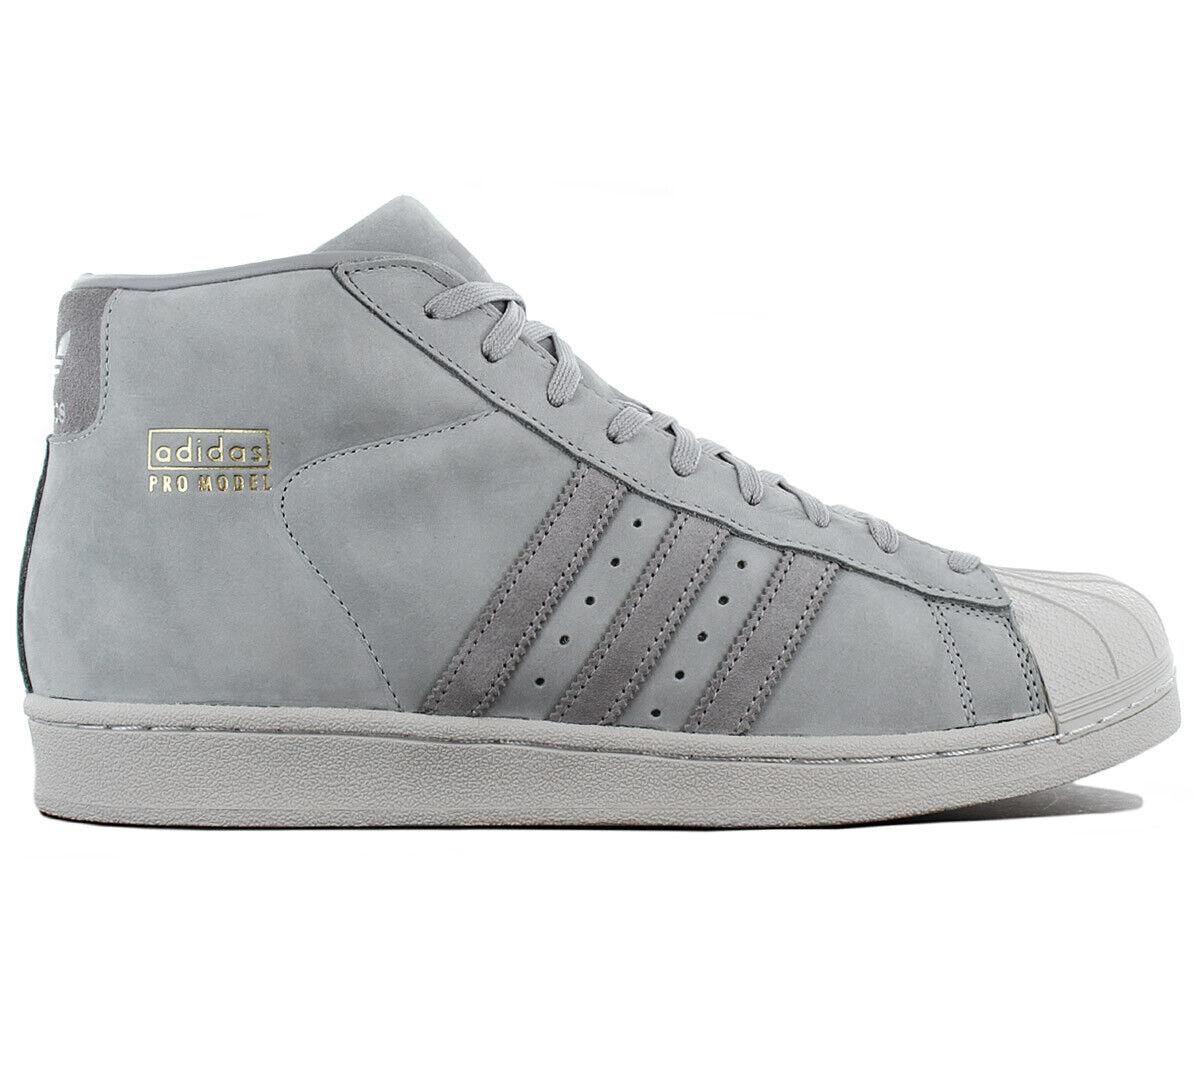 Adidas Originals Pro Model Leather Superstar Turnschuhe Schuh Grau BZ0215 Turnschuh    | Stil